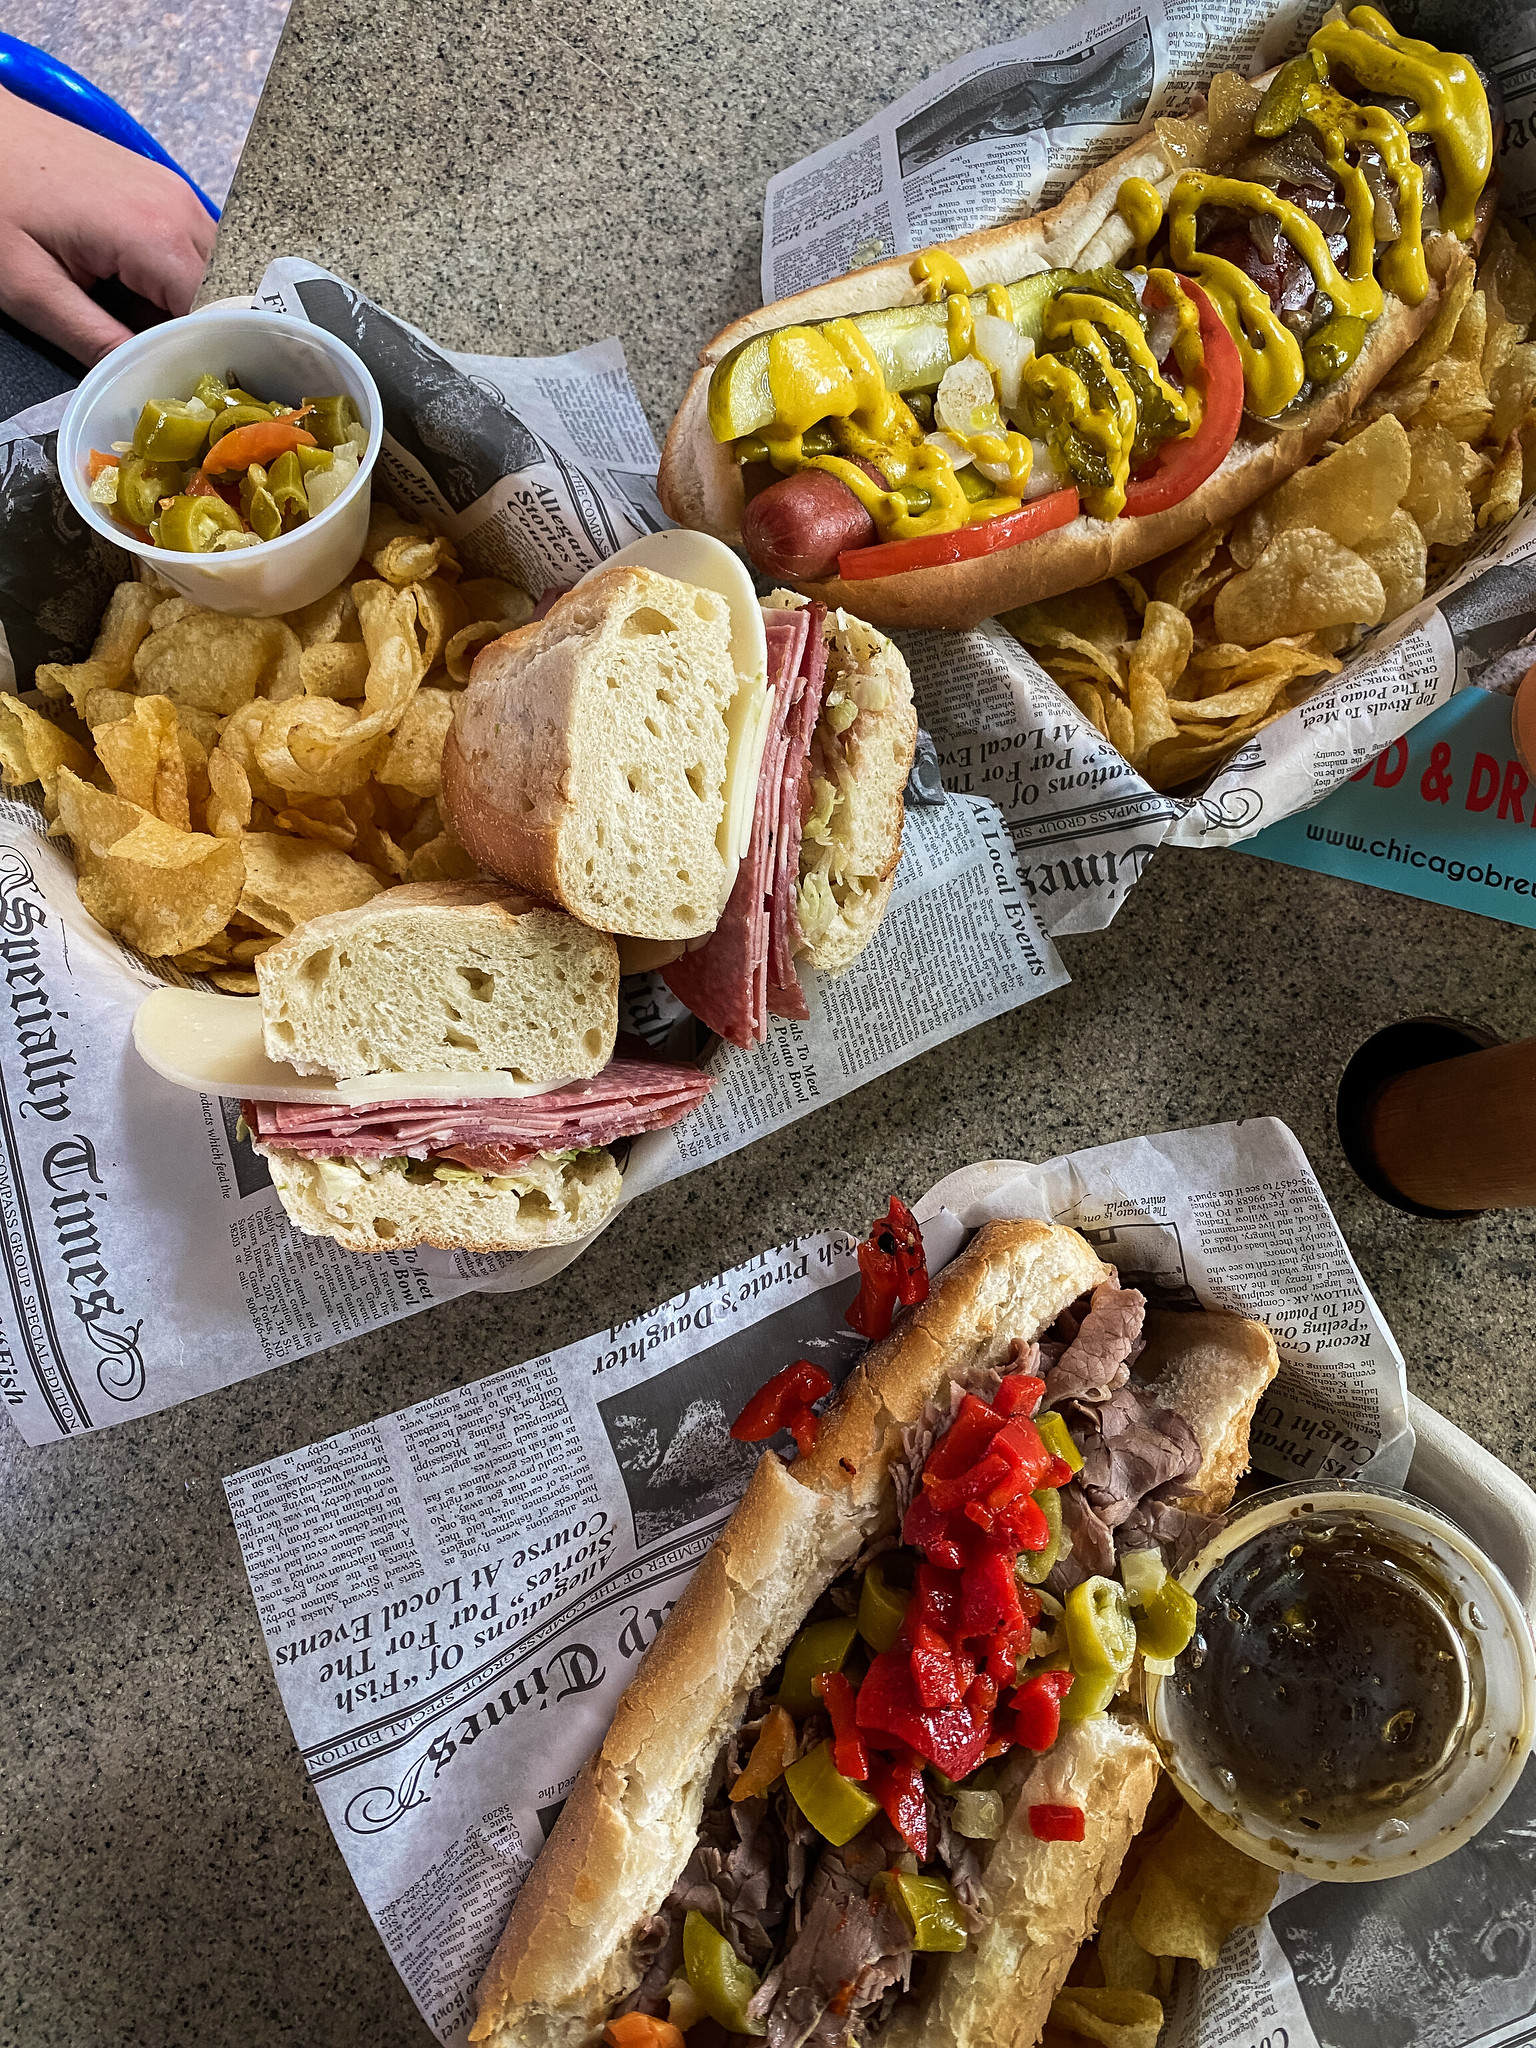 Maxwell Street Split Foot Long Hot Dog & Polish Sausage